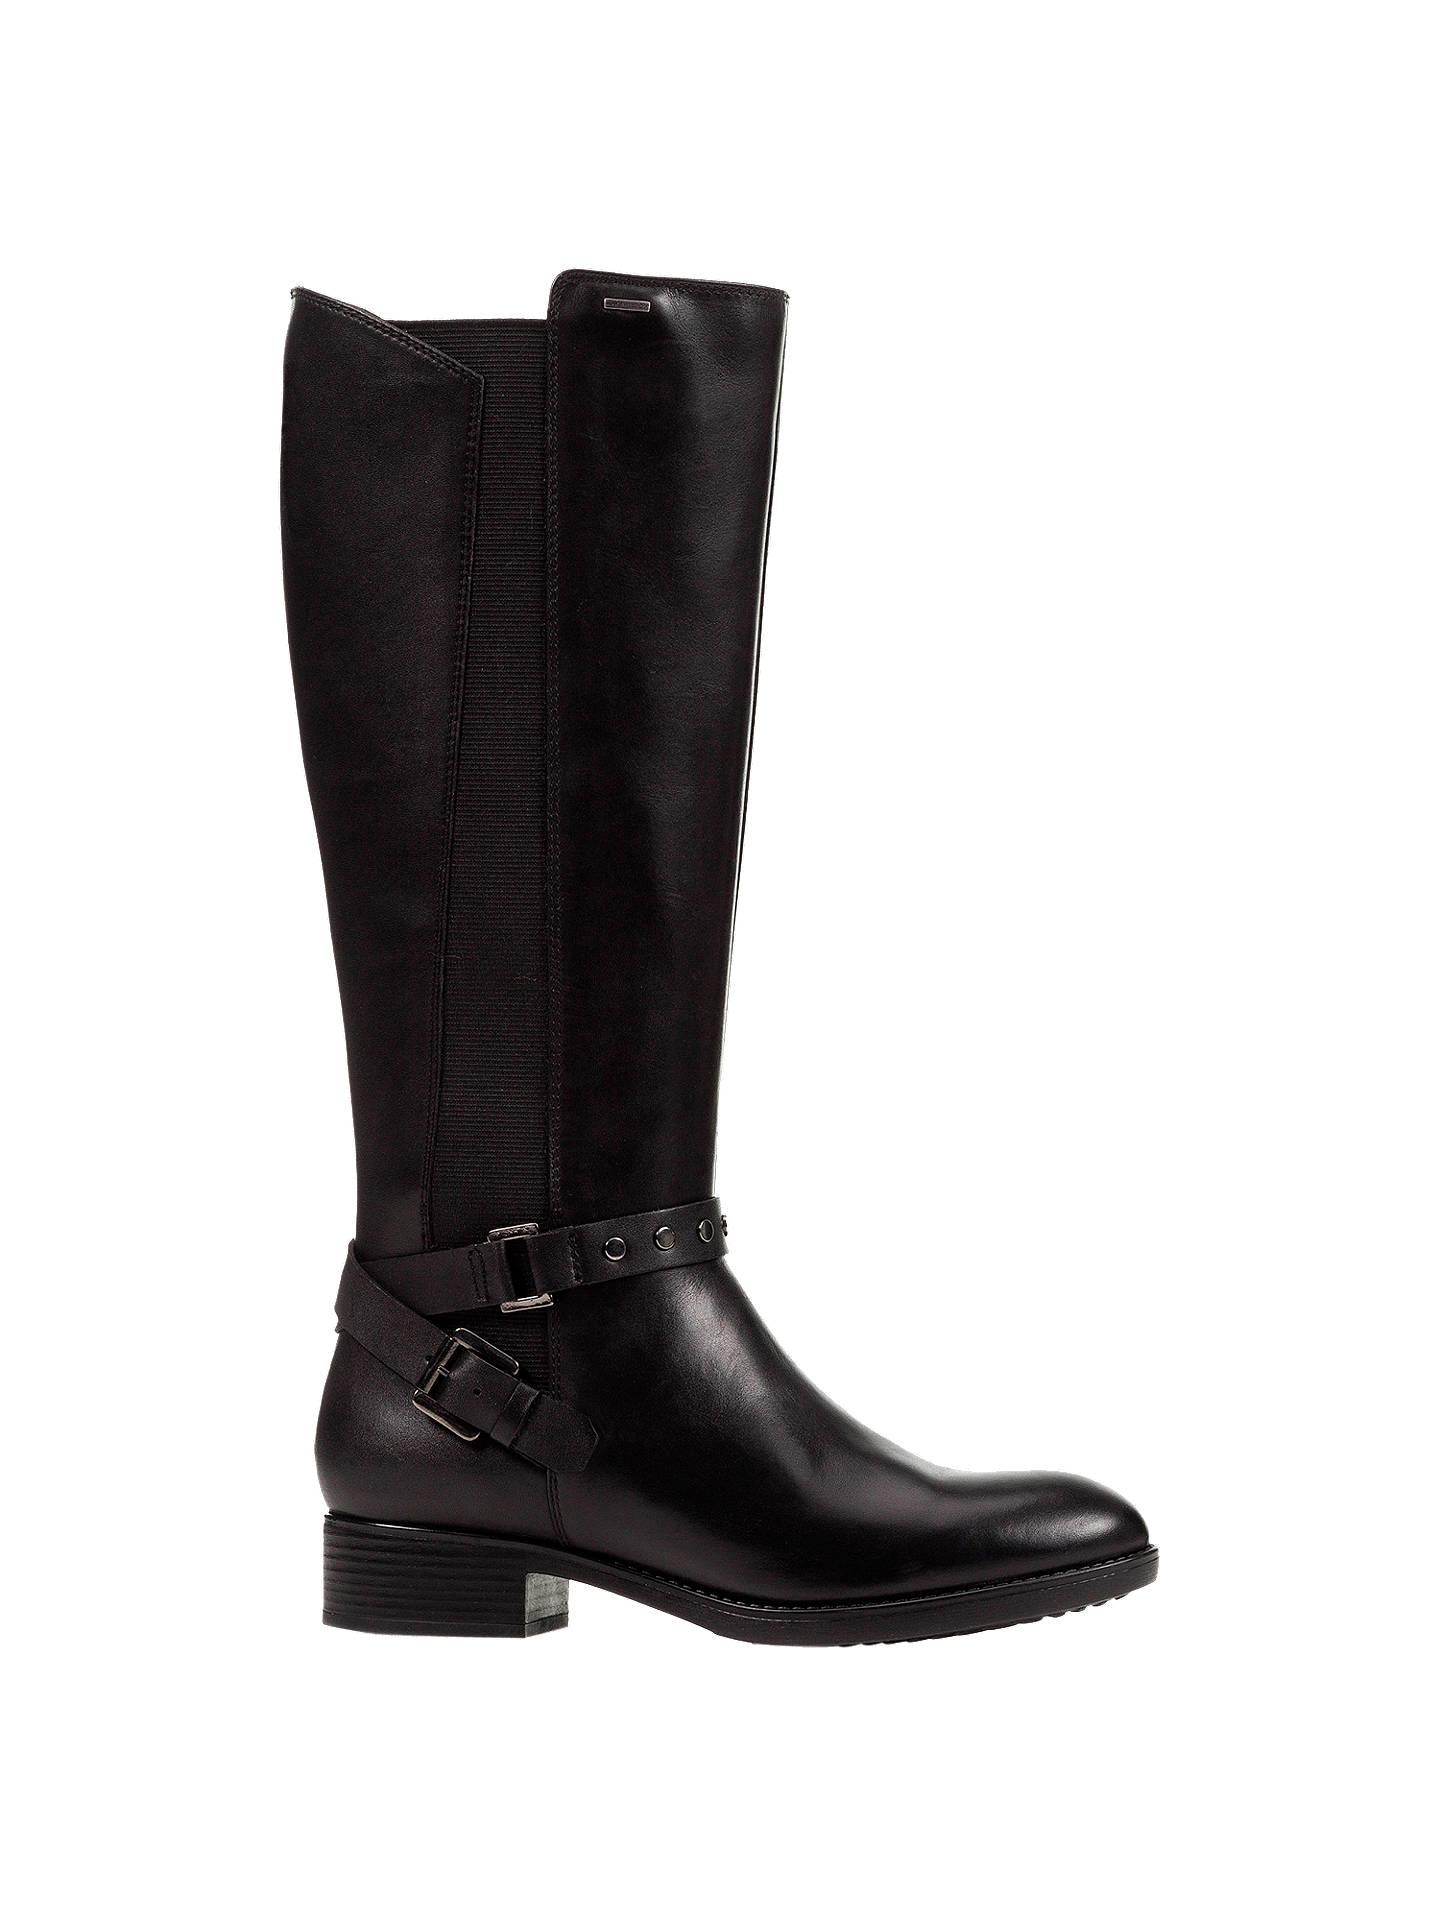 618601d568061 Buy Geox Women's Felicity Napa Block Heel Tall Boots, Black Leather, 4  Online at ...